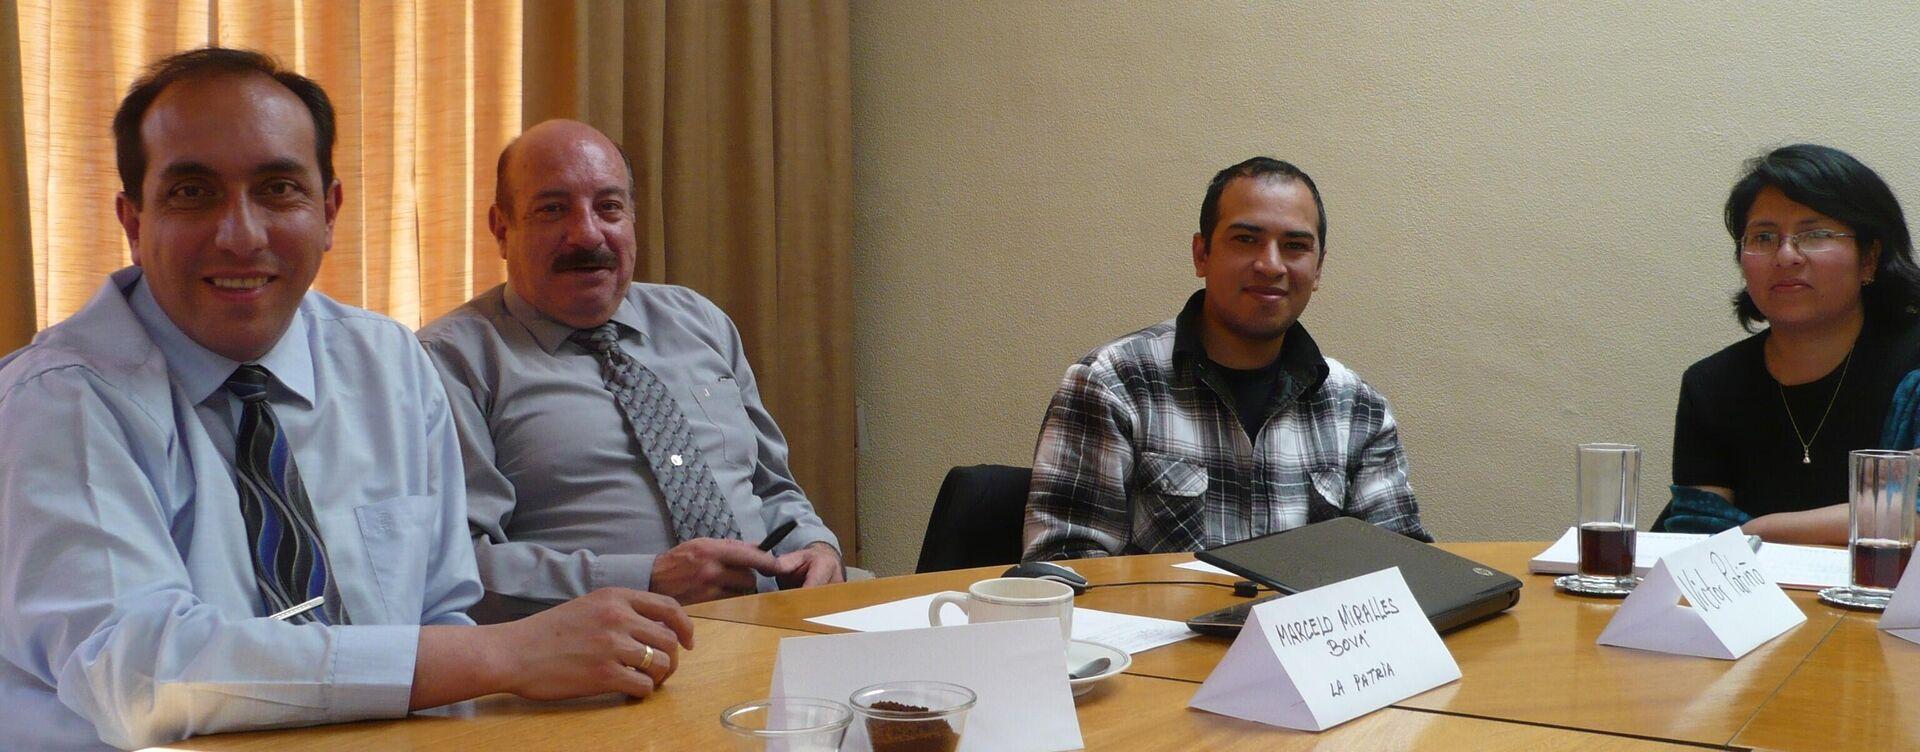 Workshops on Communication in Bolivia